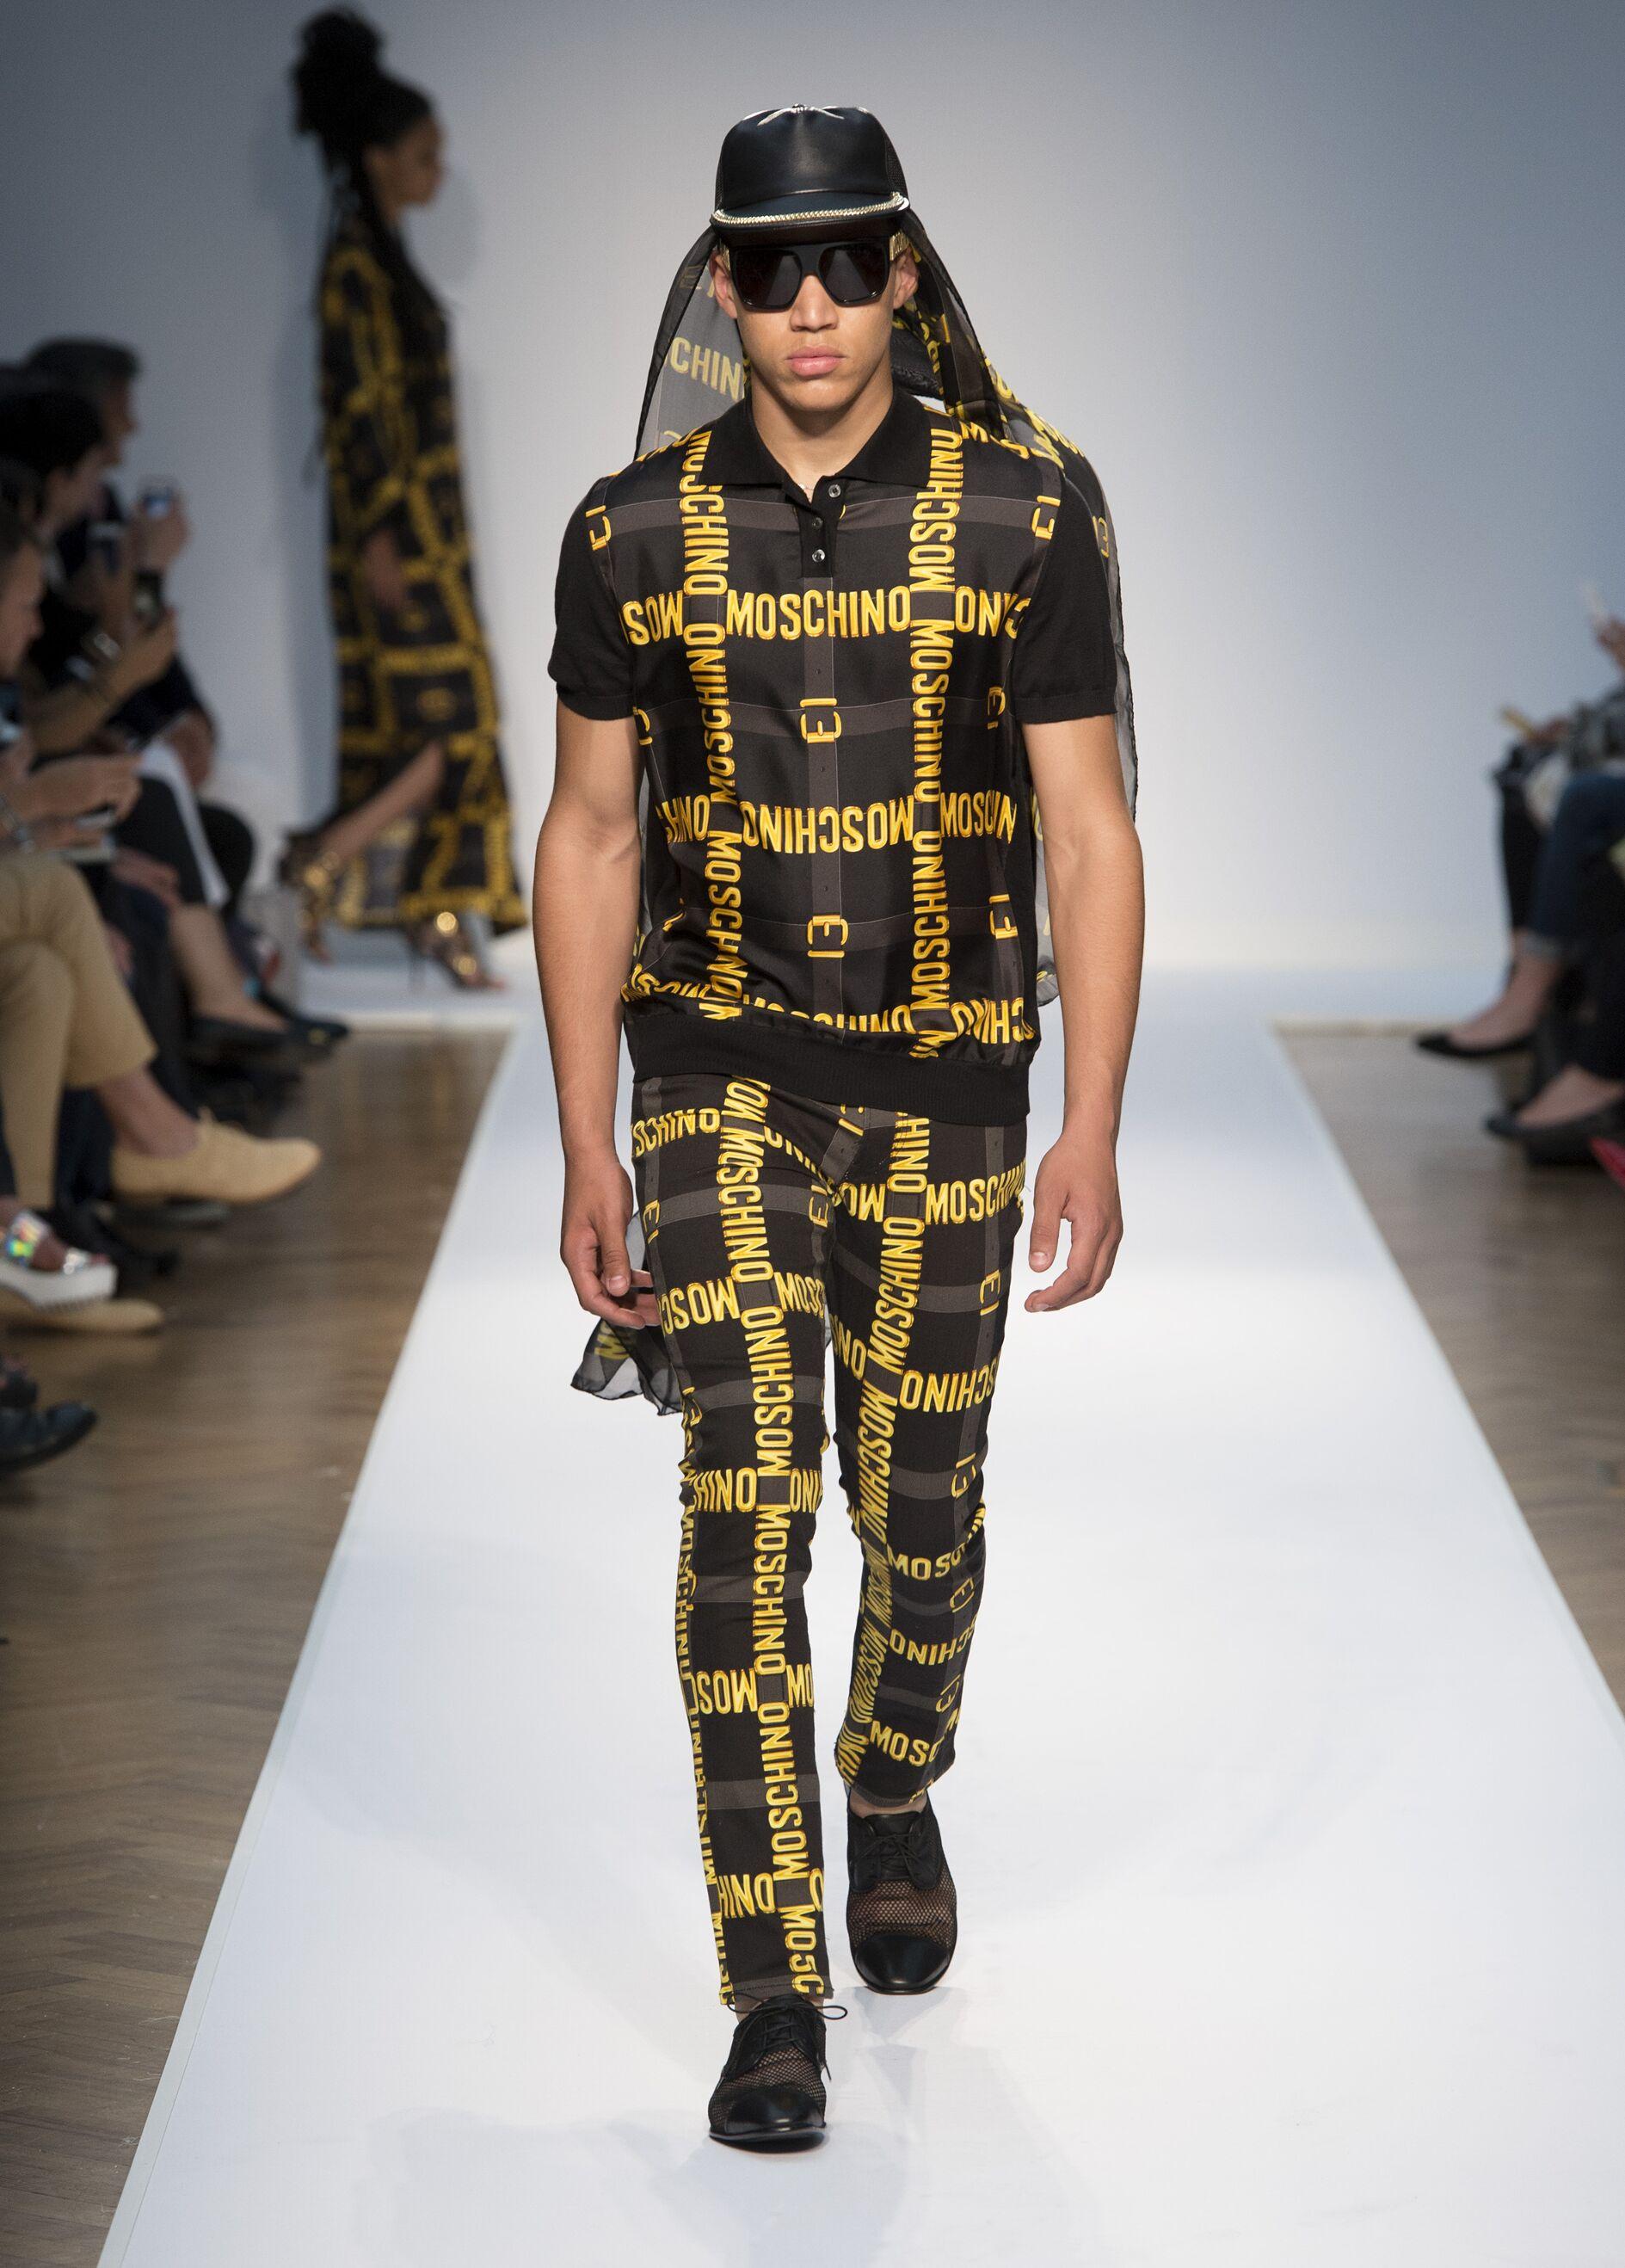 Catwalk Moschino SS 2015 Menswear